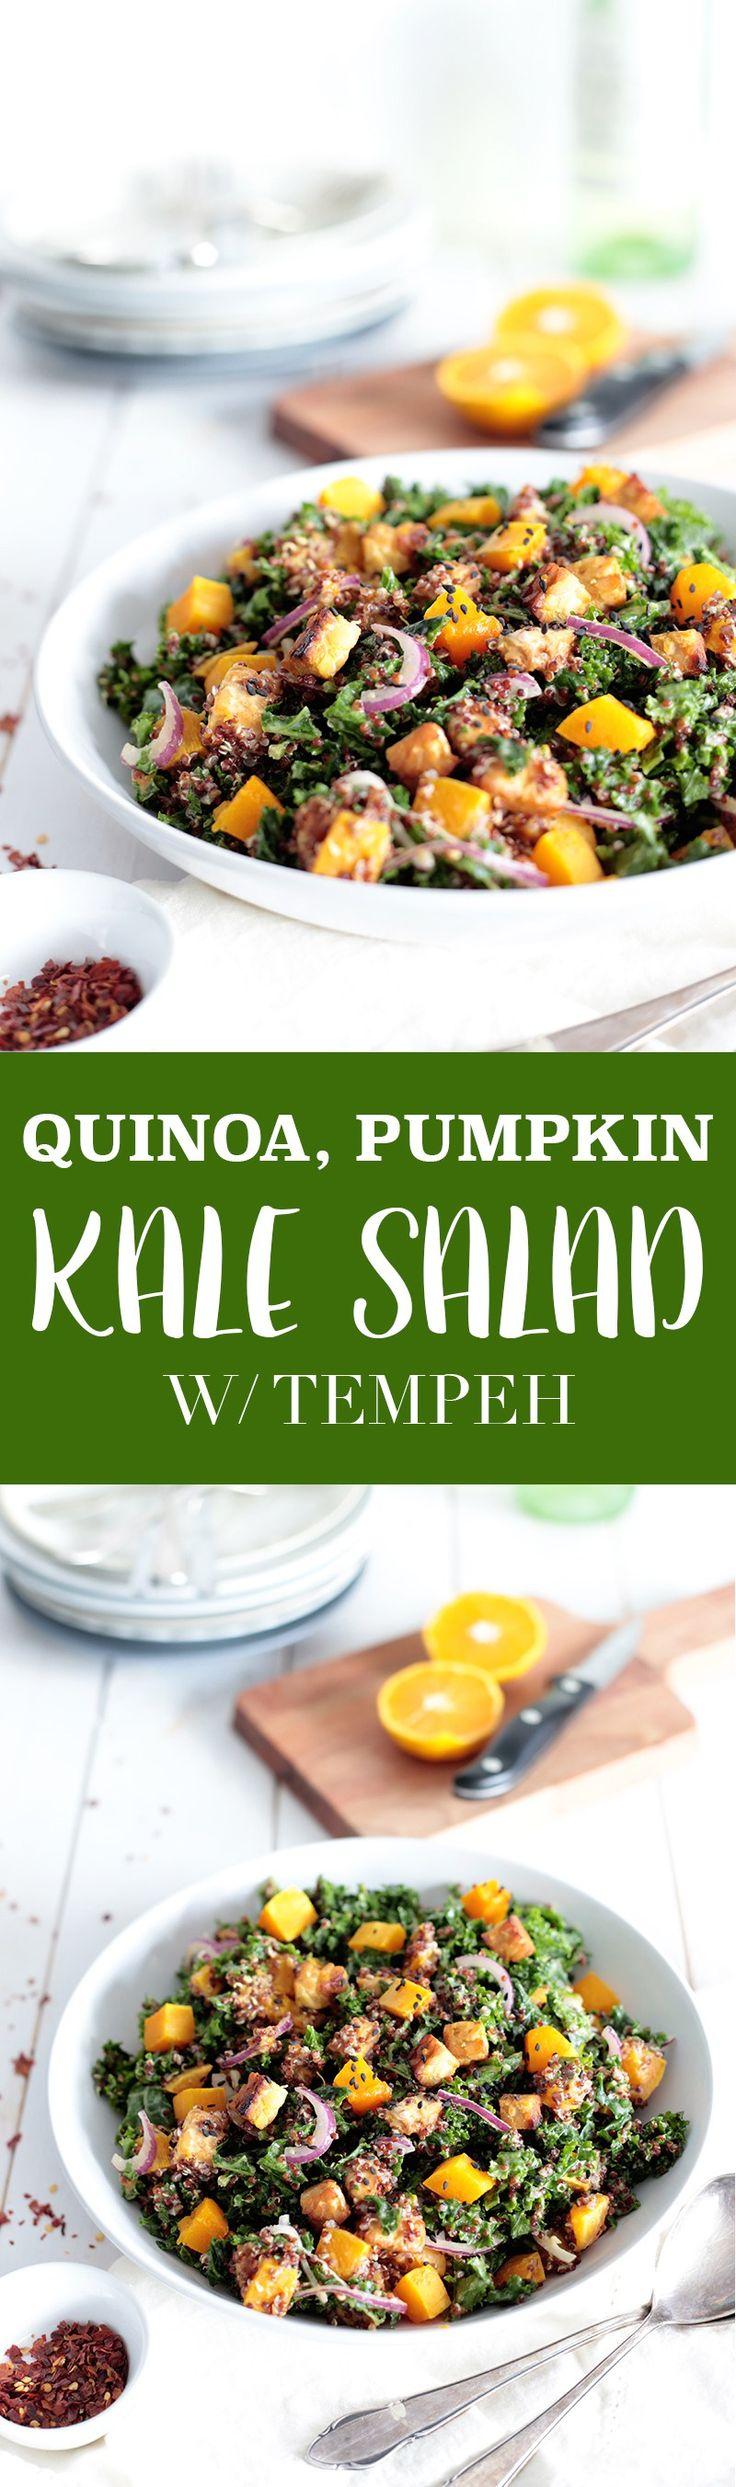 Quinoa, Pumpkin and Kale Salad with Tempeh